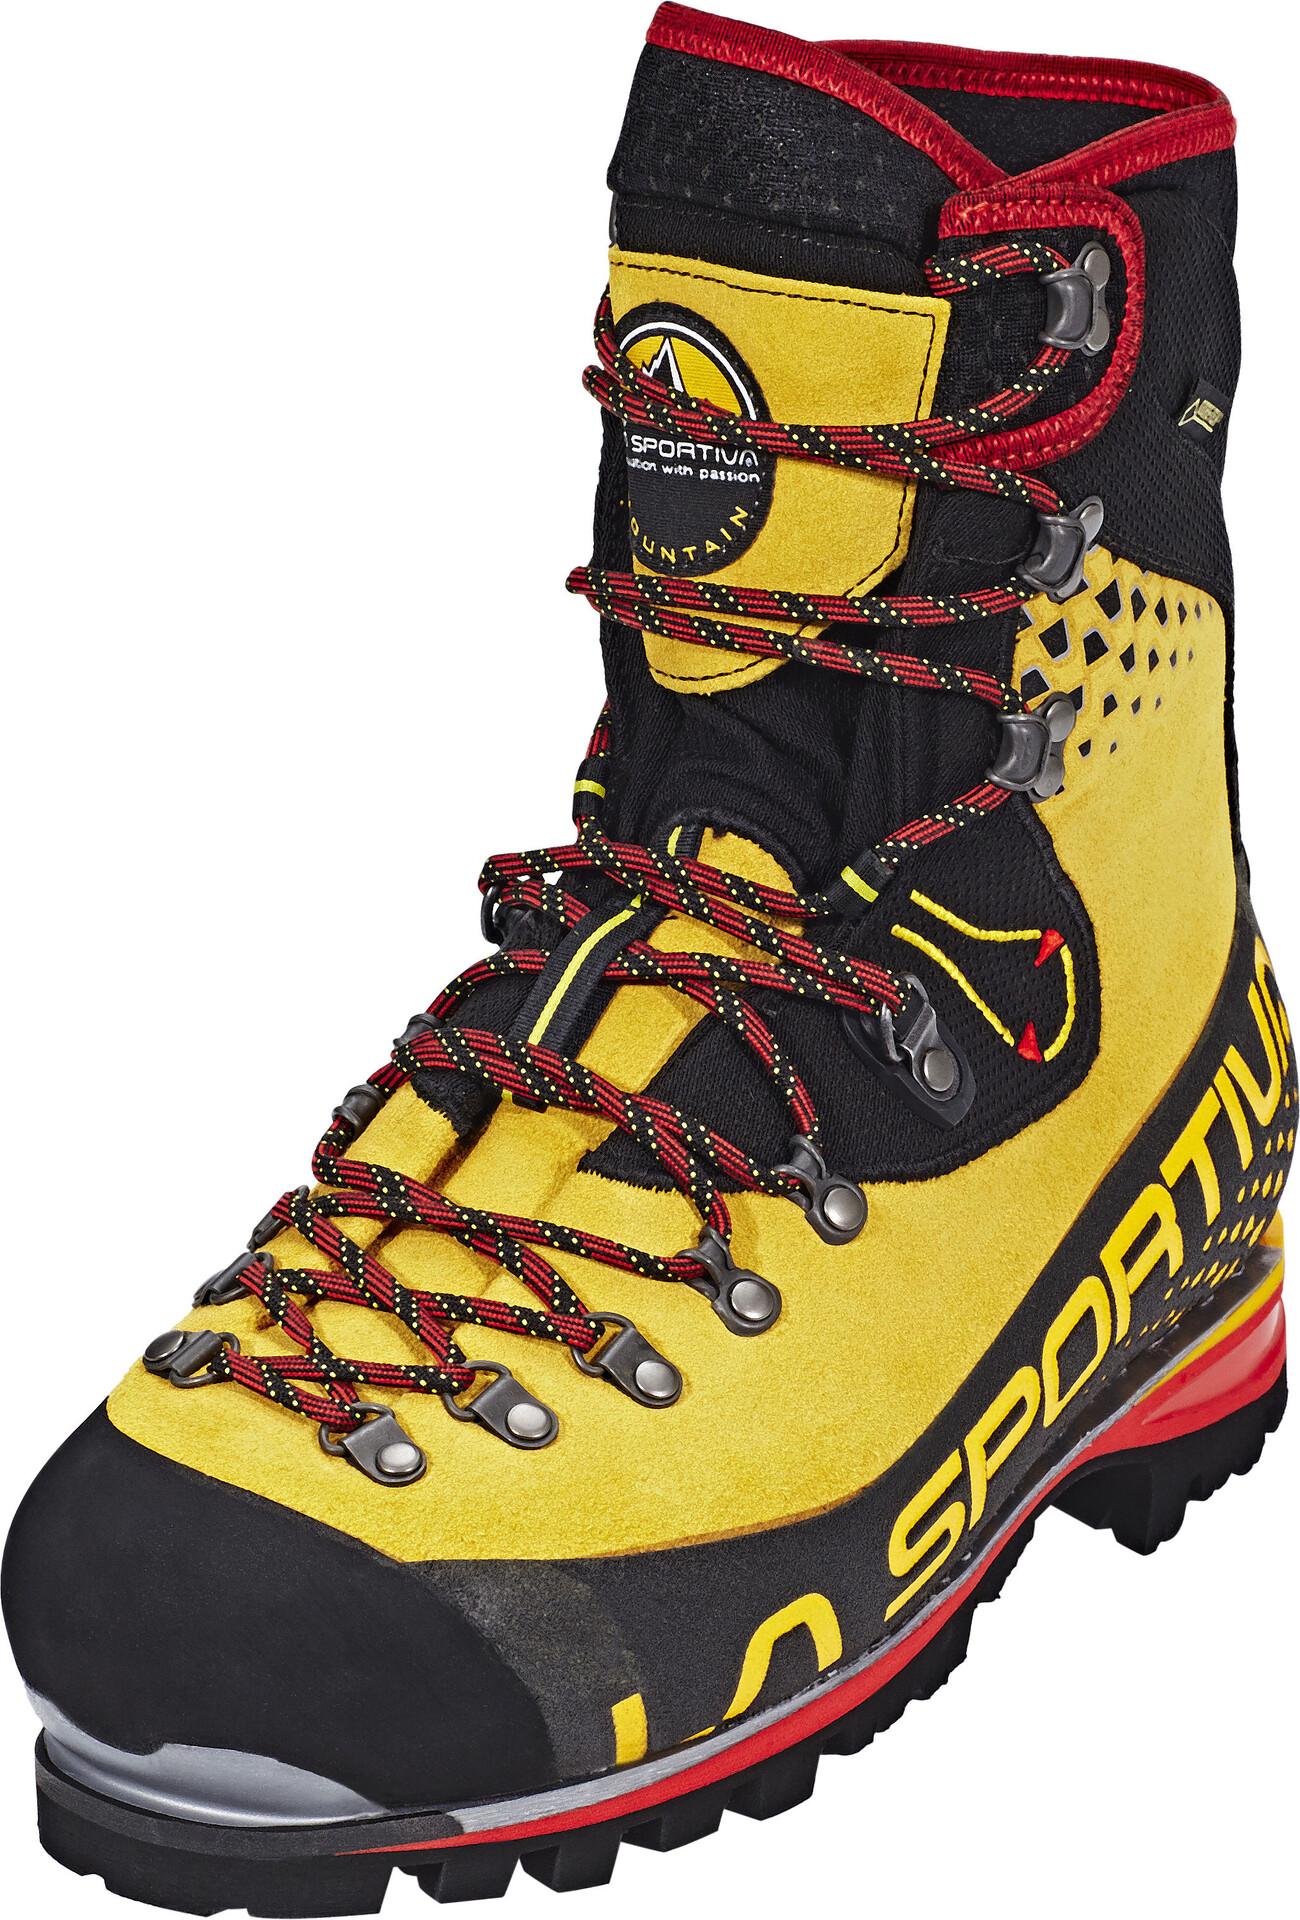 Nepal La Shoes Herren Cube Gtx Yellow Sportiva jqpUGzMSVL